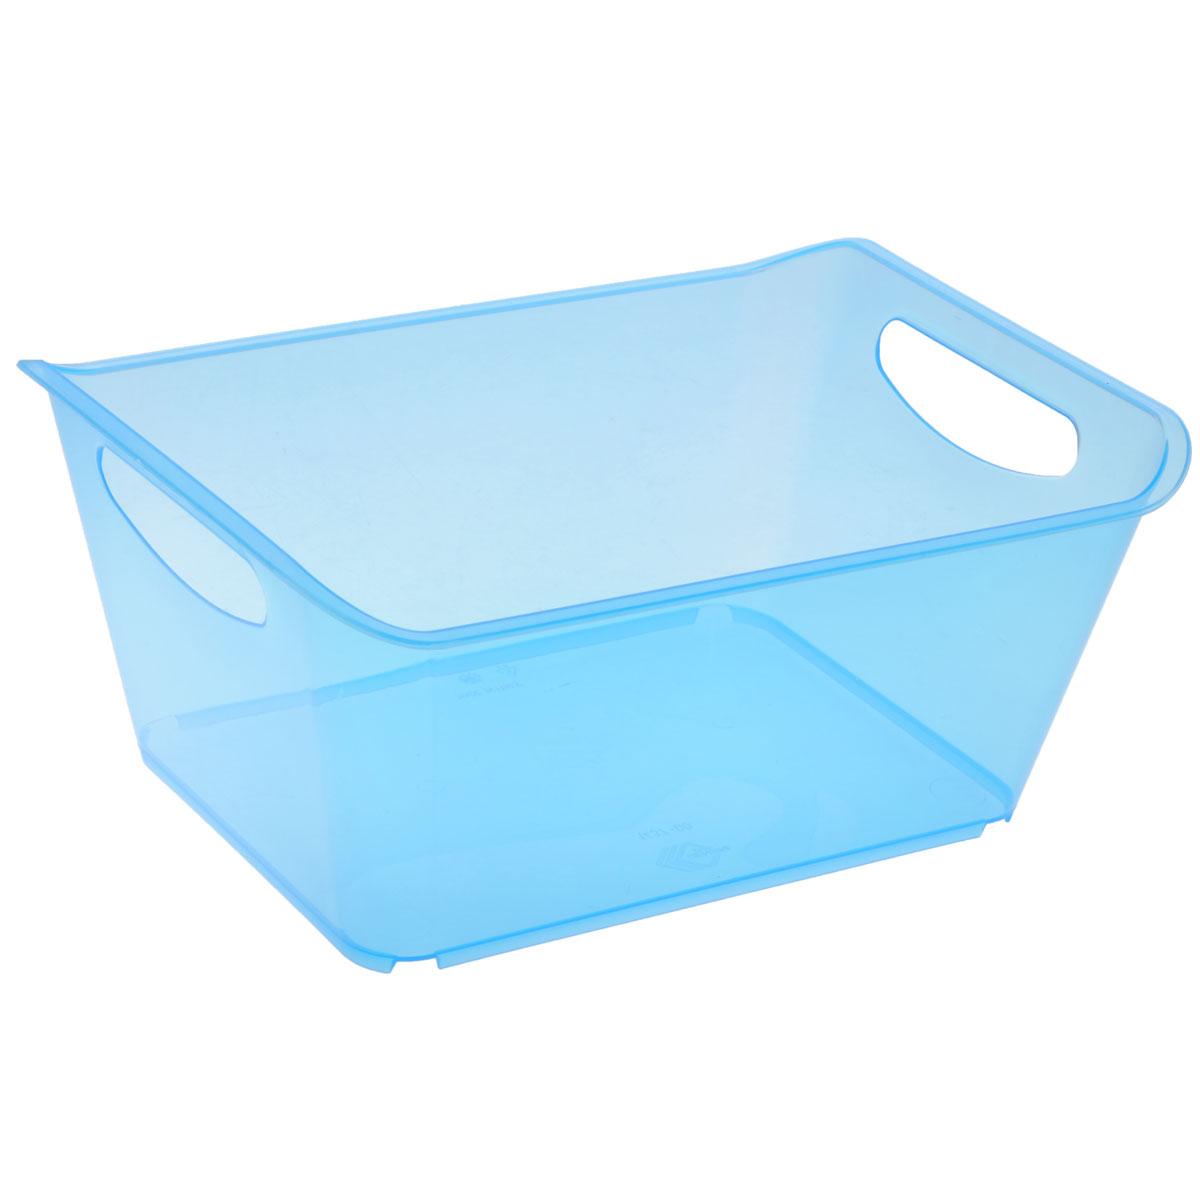 Контейнер Gensini, цвет: голубой, 5 л контейнер gensini цвет сиреневый 10 л